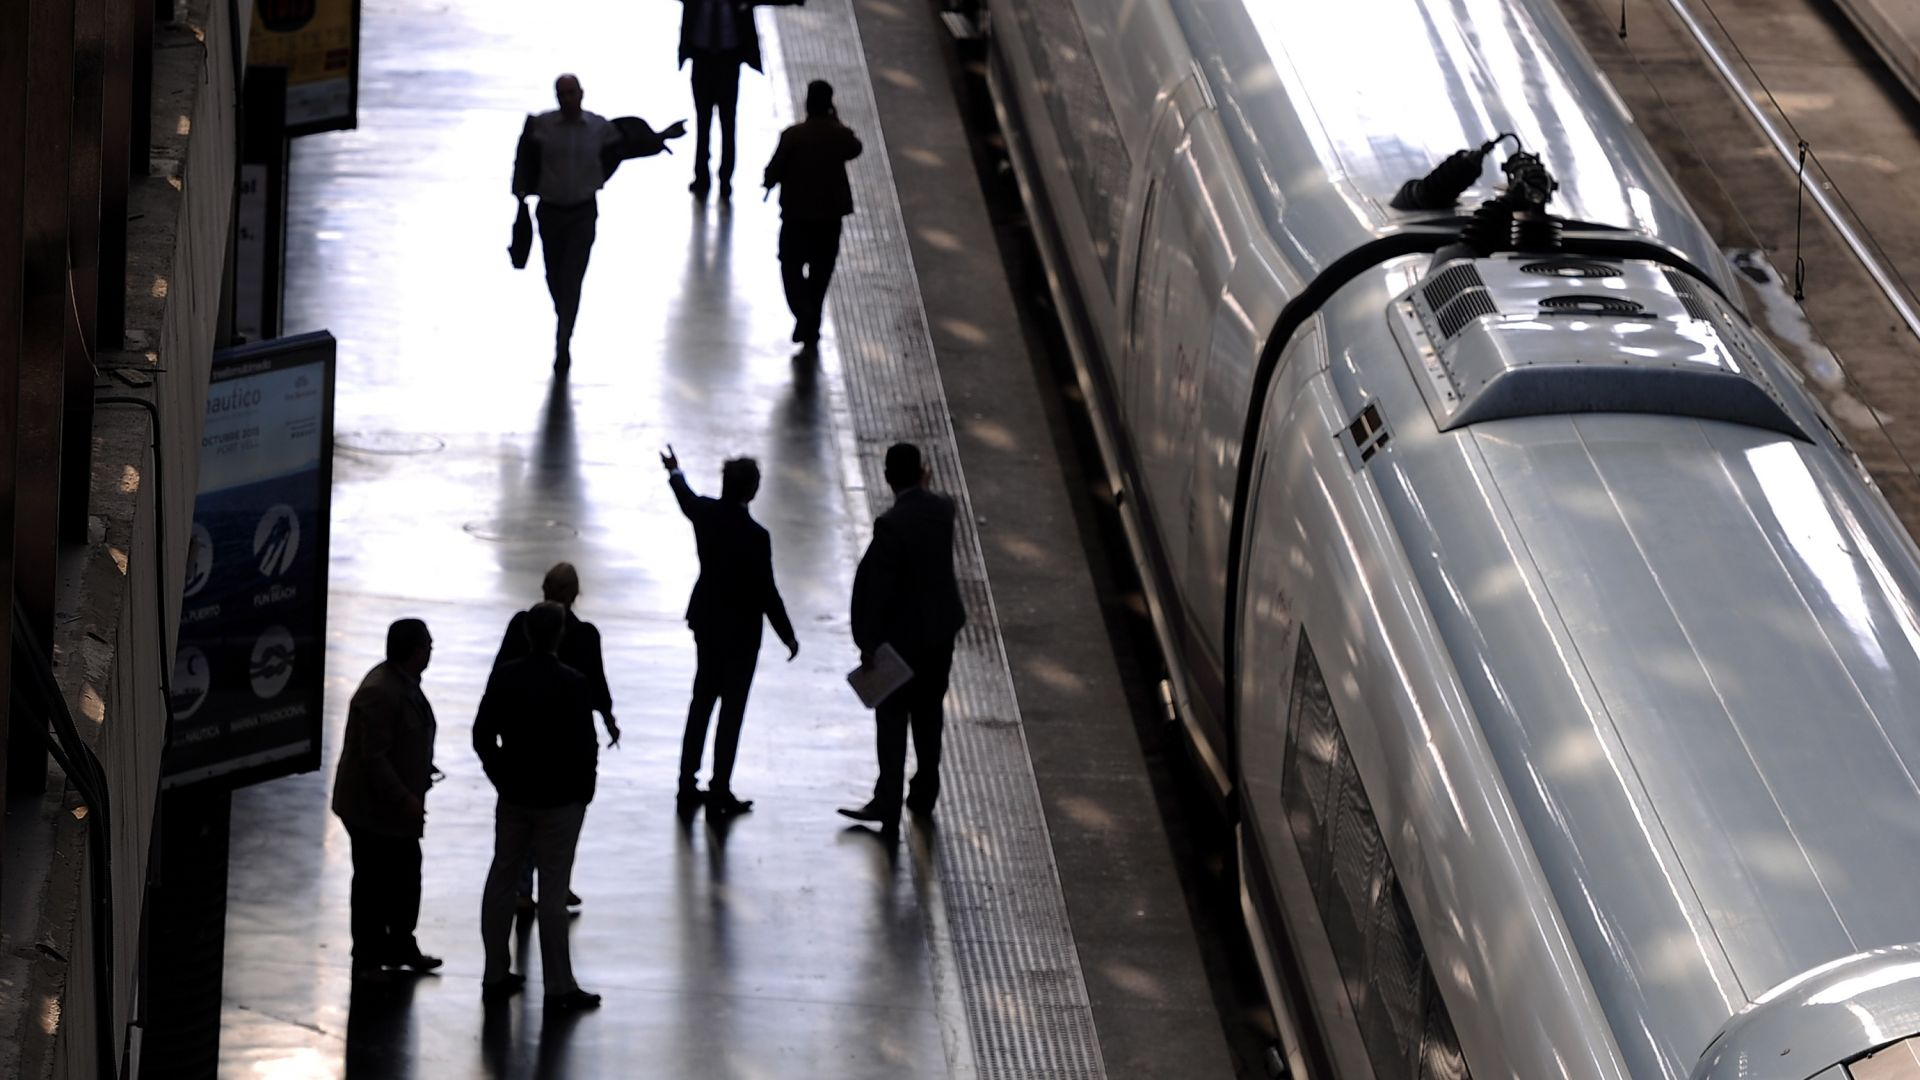 Евакуираха две жп гари в Мадрид и Барселона заради бомбени заплахи